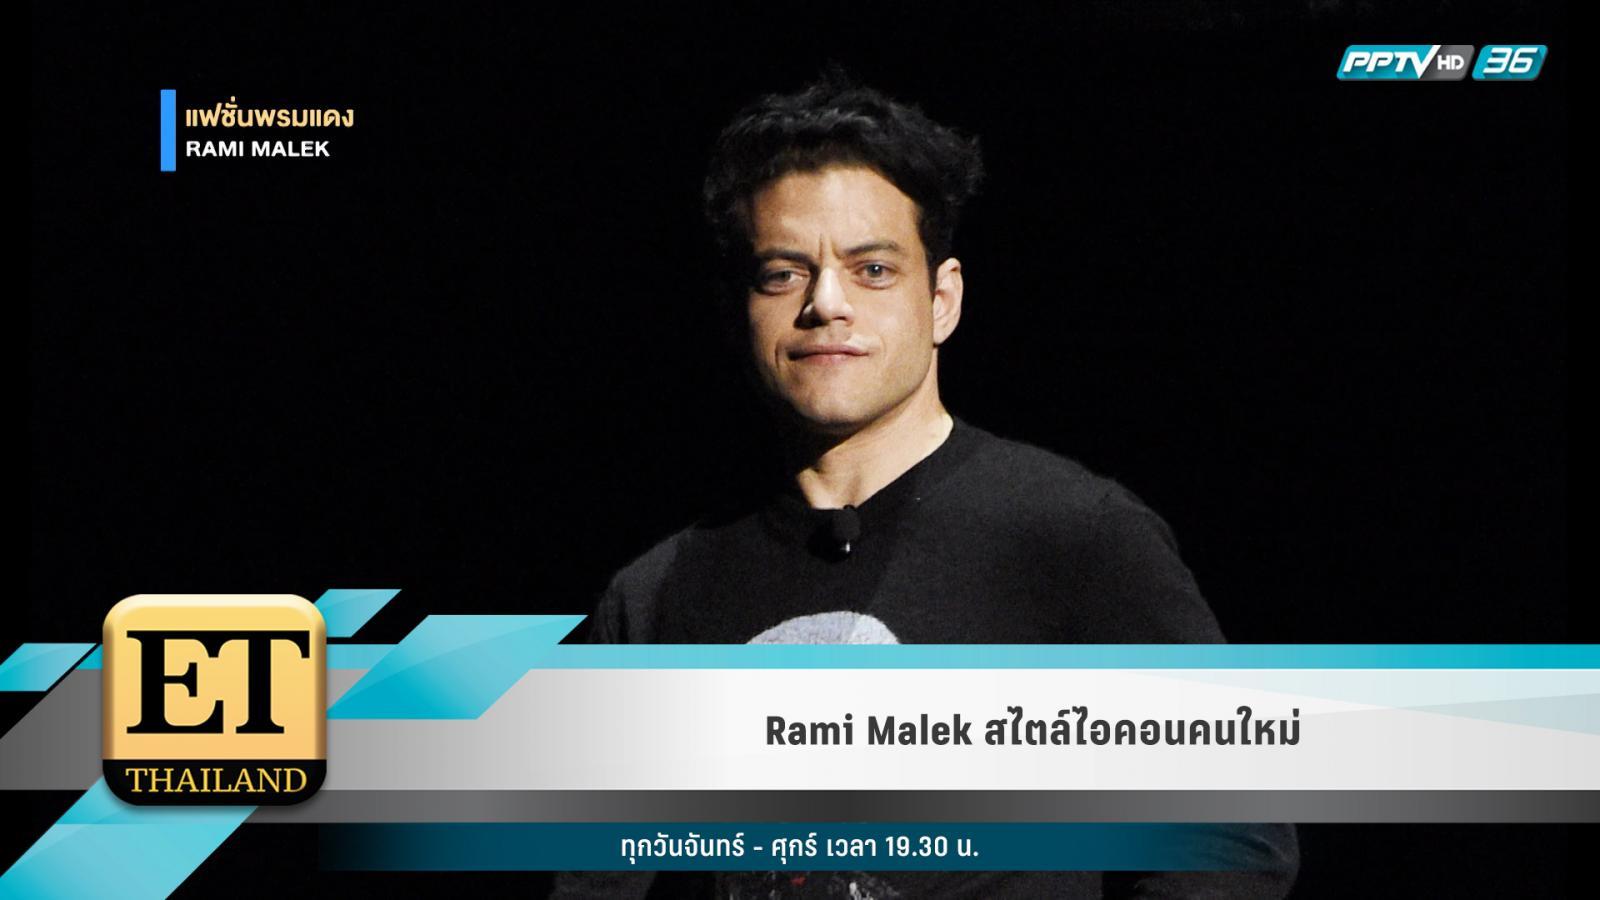 Rami Malek สไตล์ไอคอนคนใหม่